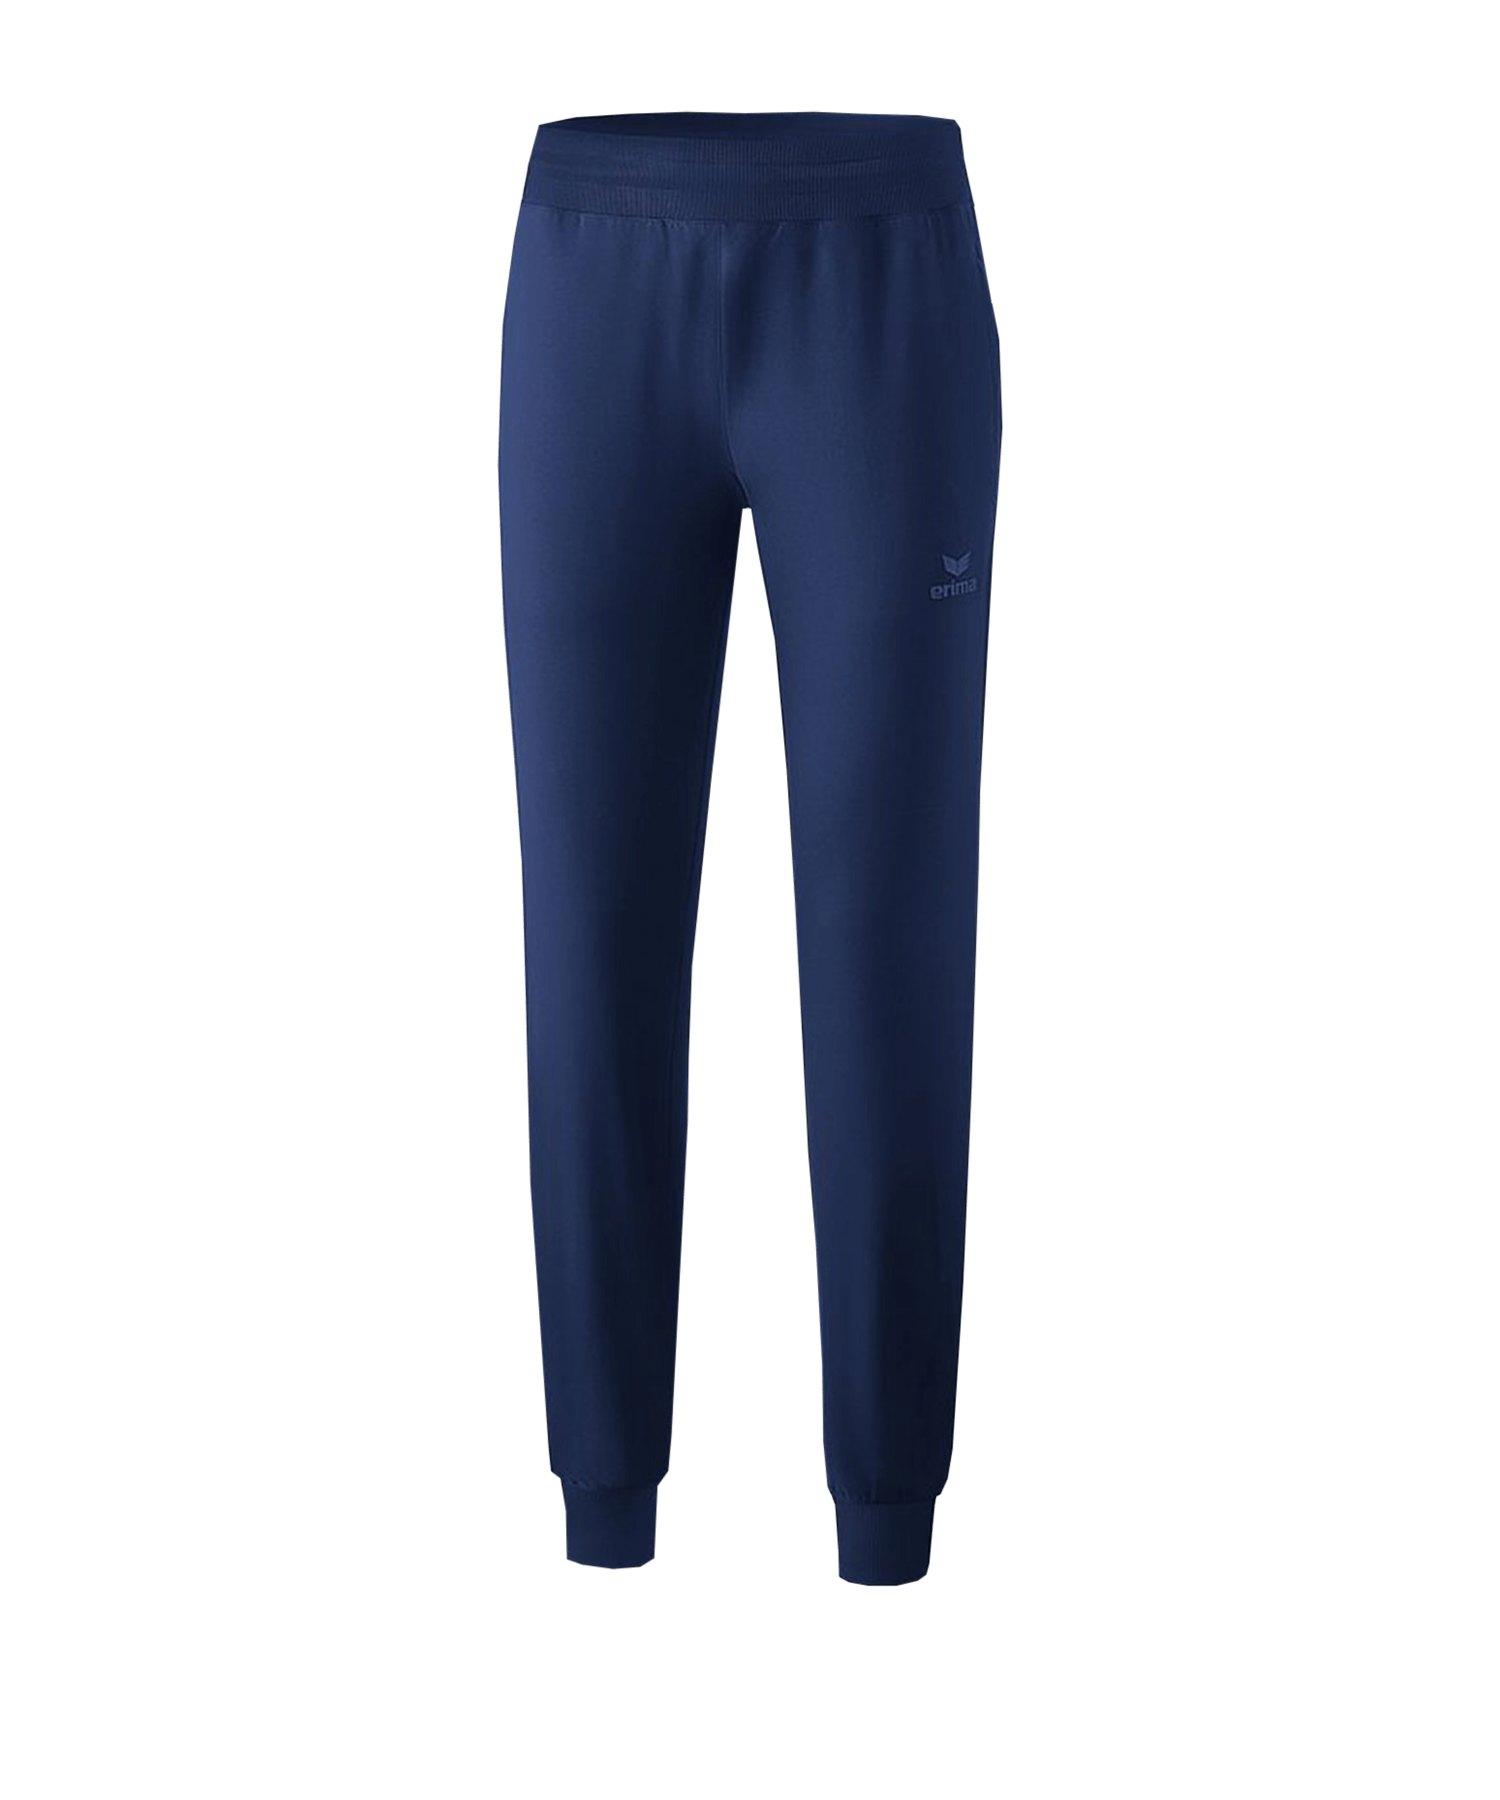 Erima Basic Präsenationshose Damen Blau - blau